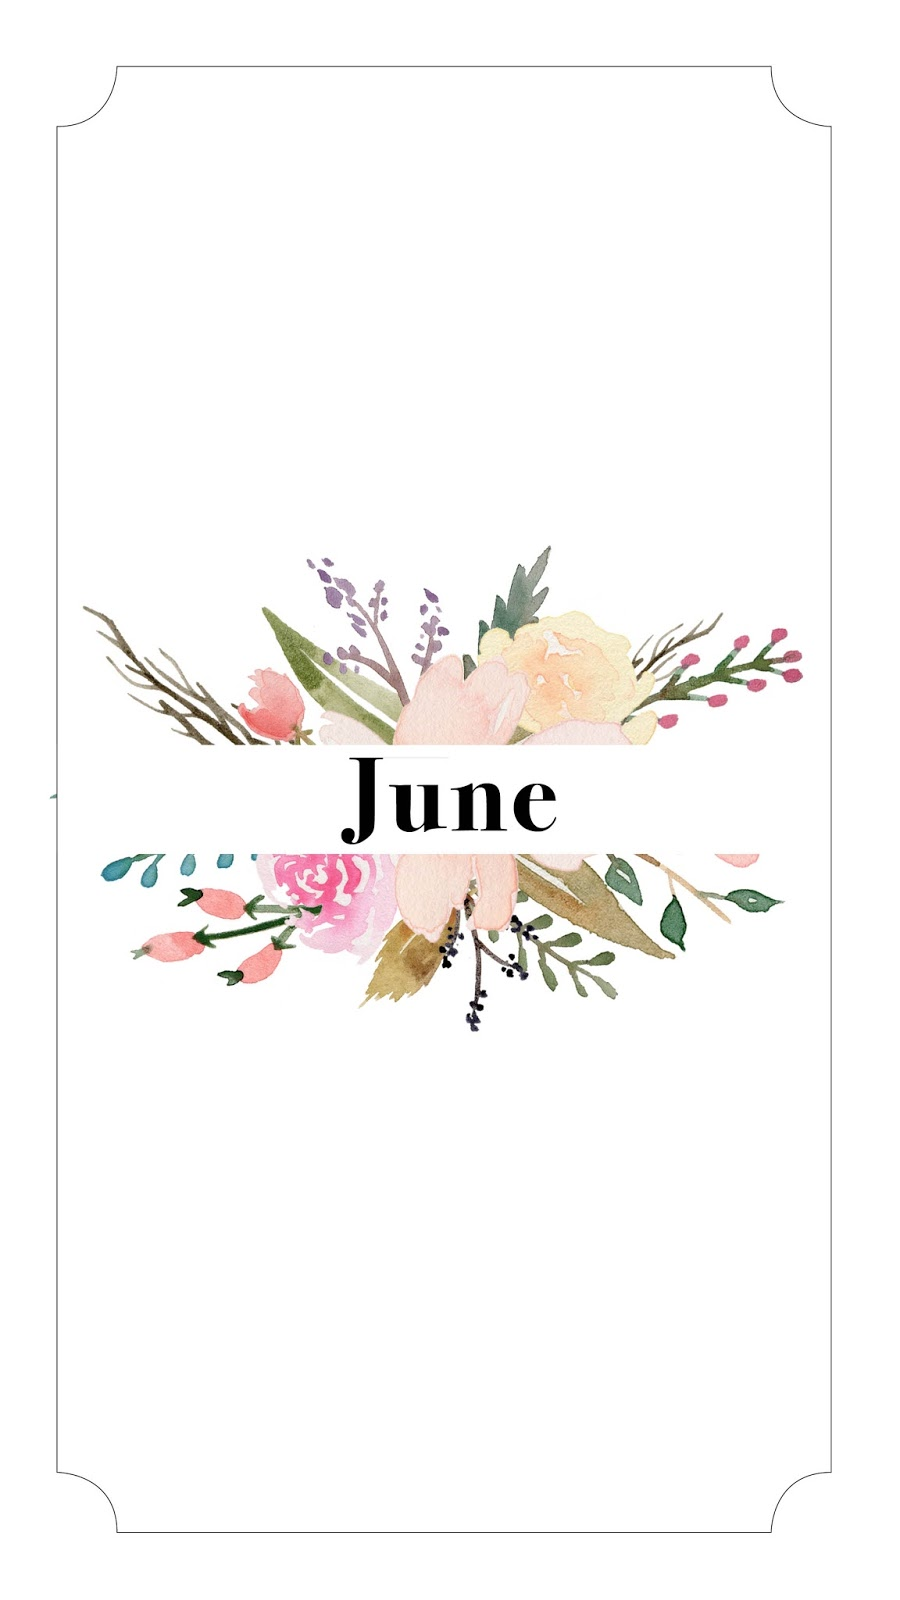 Calendar Girl June Read : Oh hey hannah